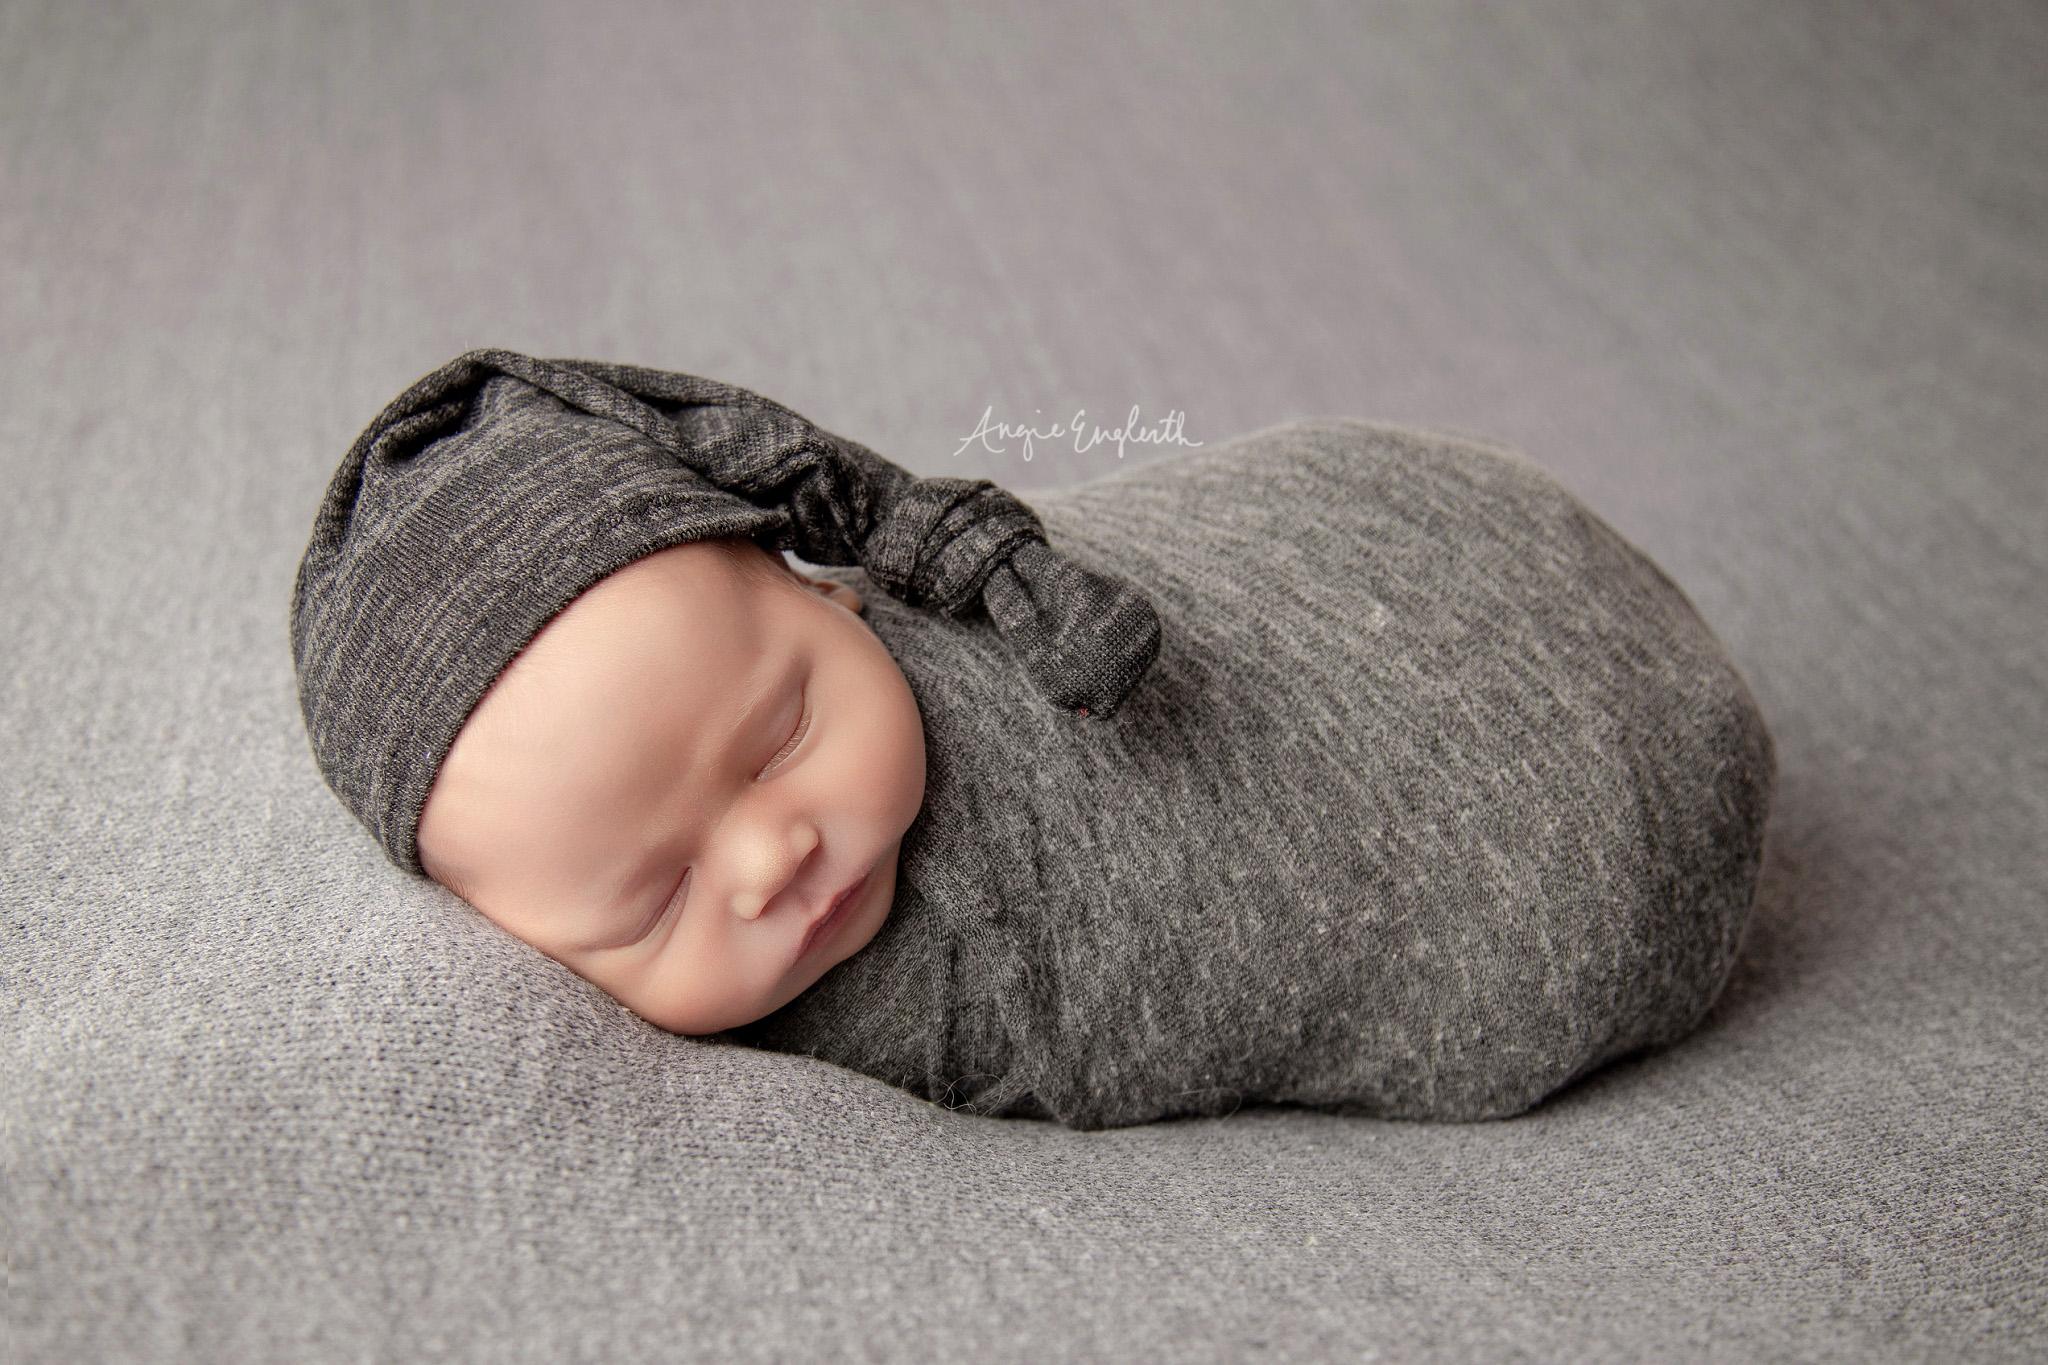 lancaster_newborn_photographer_angie_englerth_central_pa_022.jpg